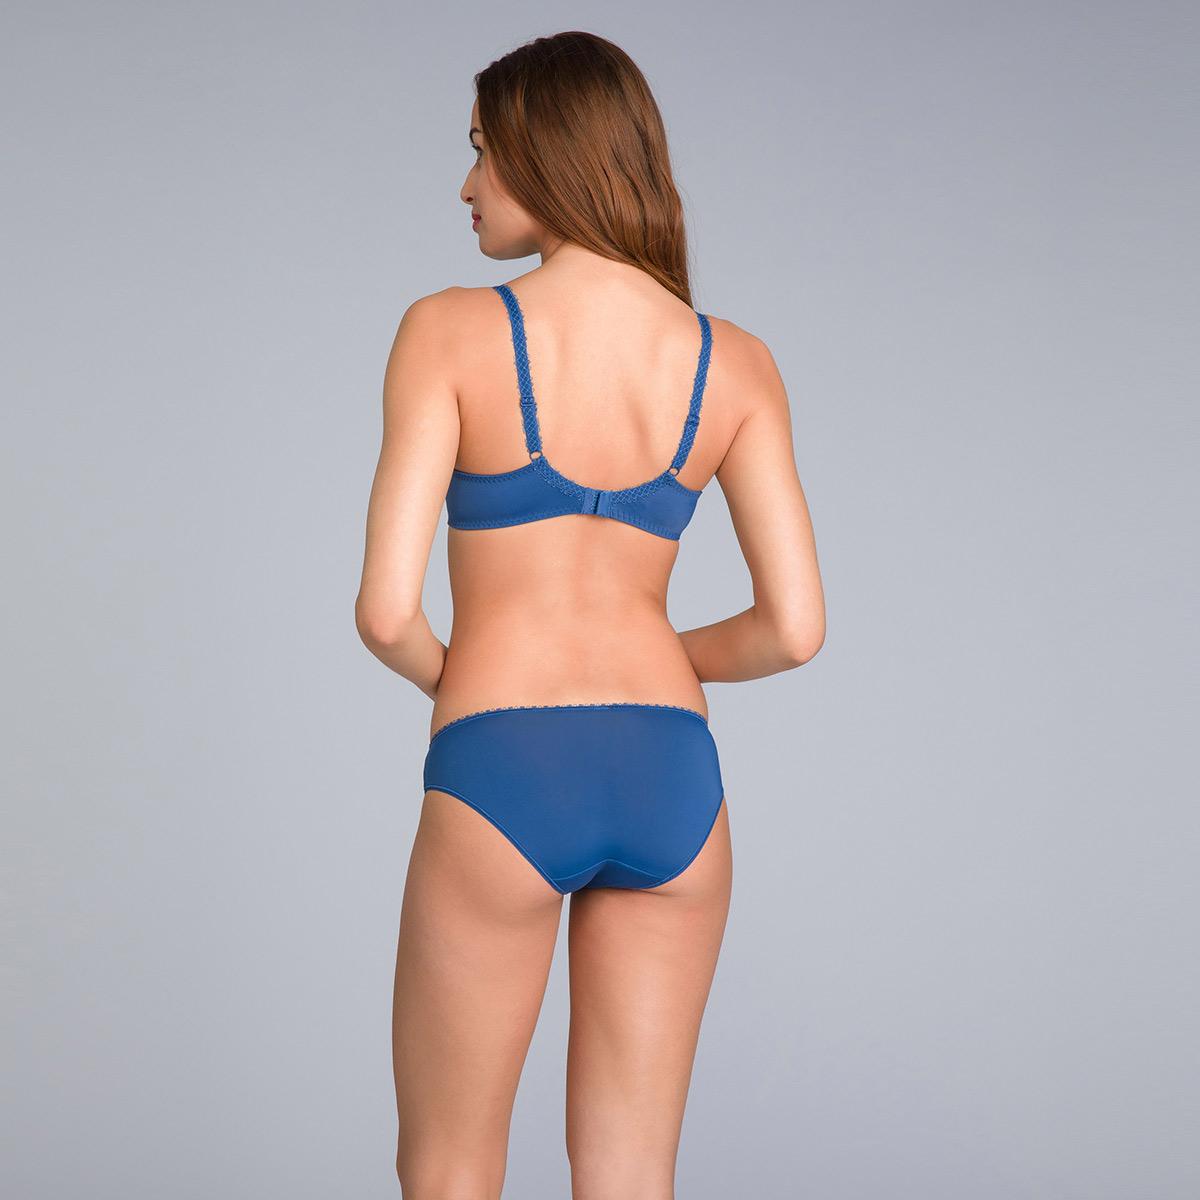 Reggiseno modellante in pizzo blu navy stampato - Flowery Lace - PLAYTEX